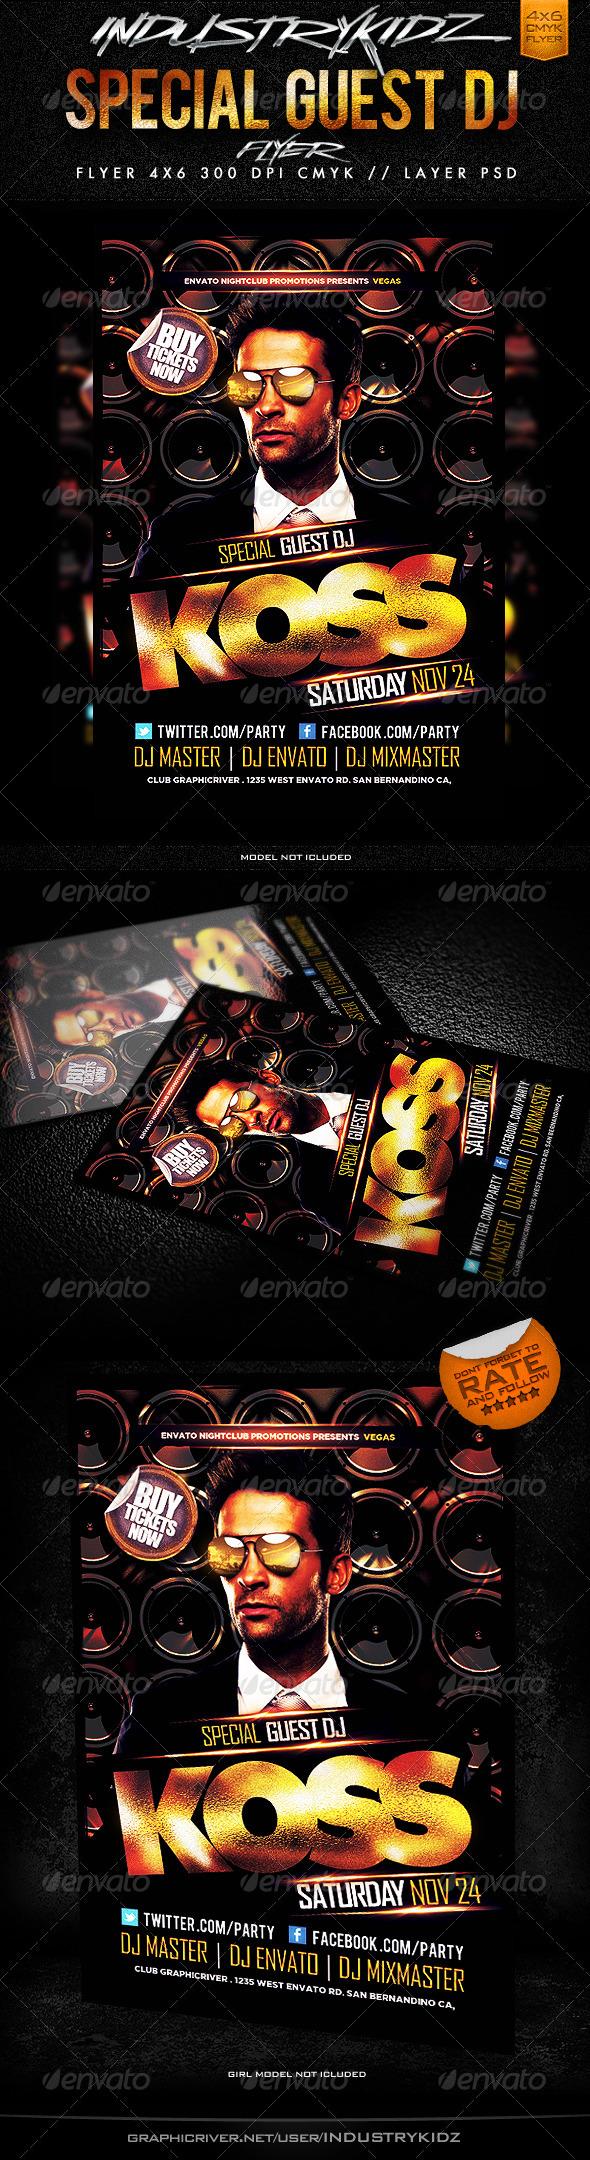 GraphicRiver Special Guest Dj Flyer Template V2 3359862